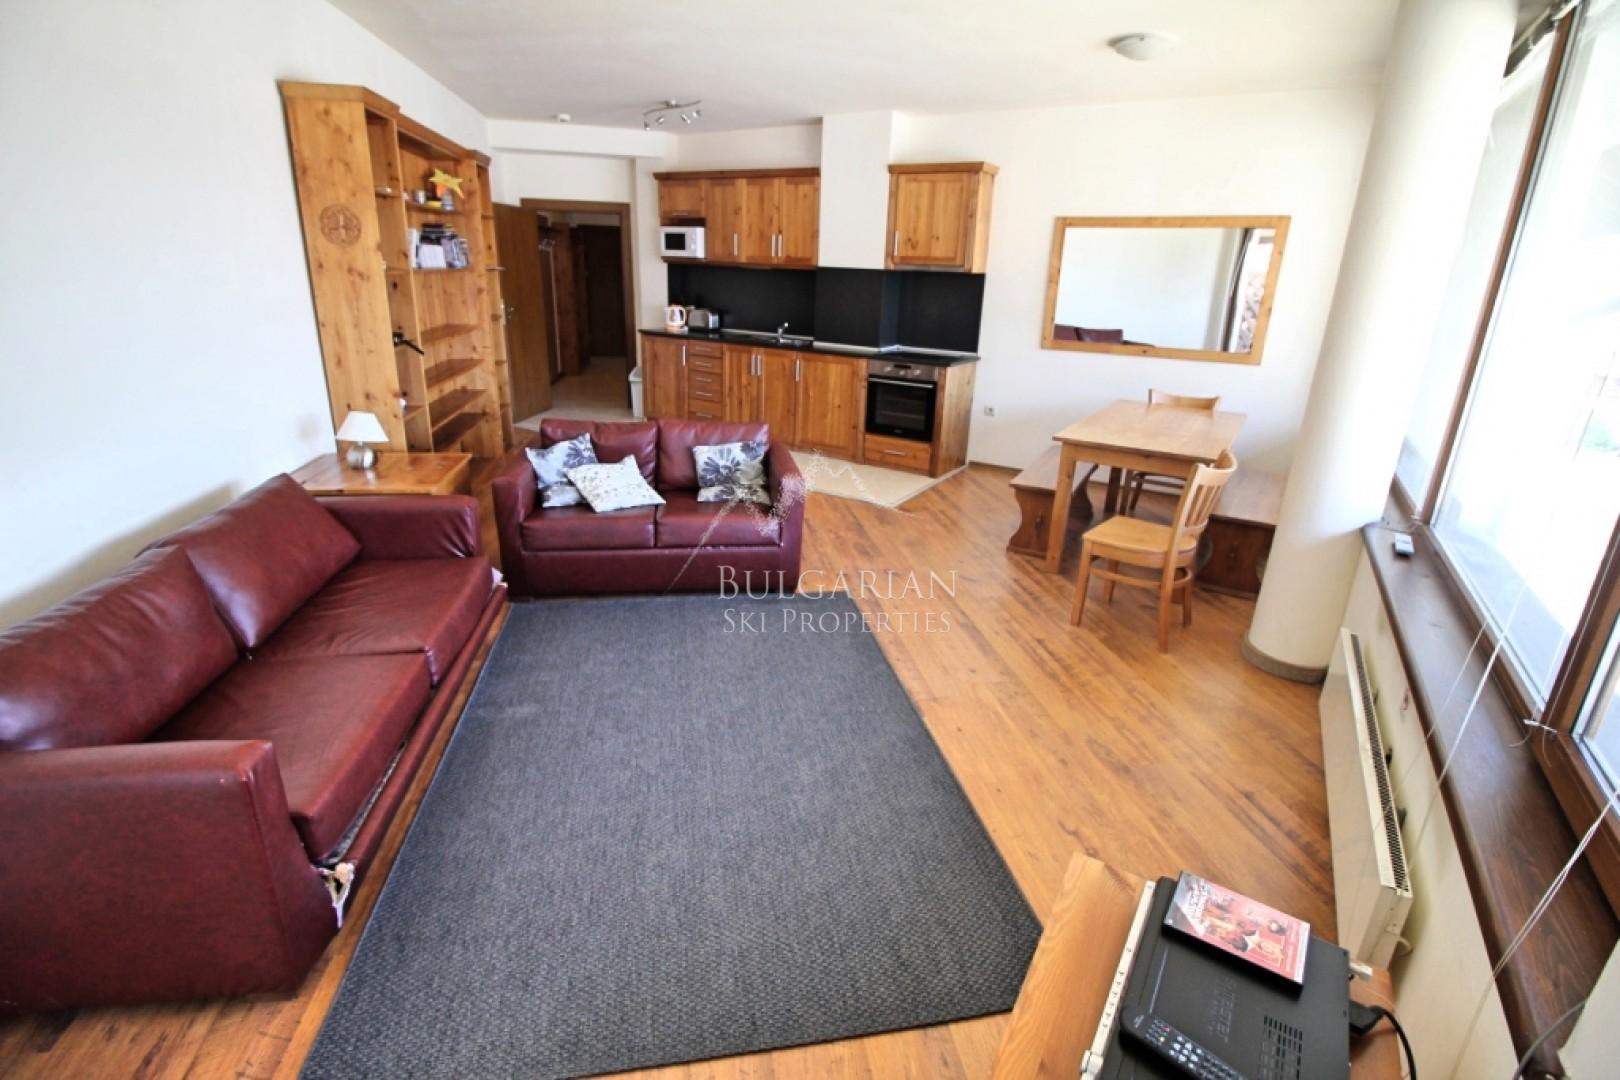 Bansko, Neon: spacious two-bedroom apartment for sale next to the ski lift